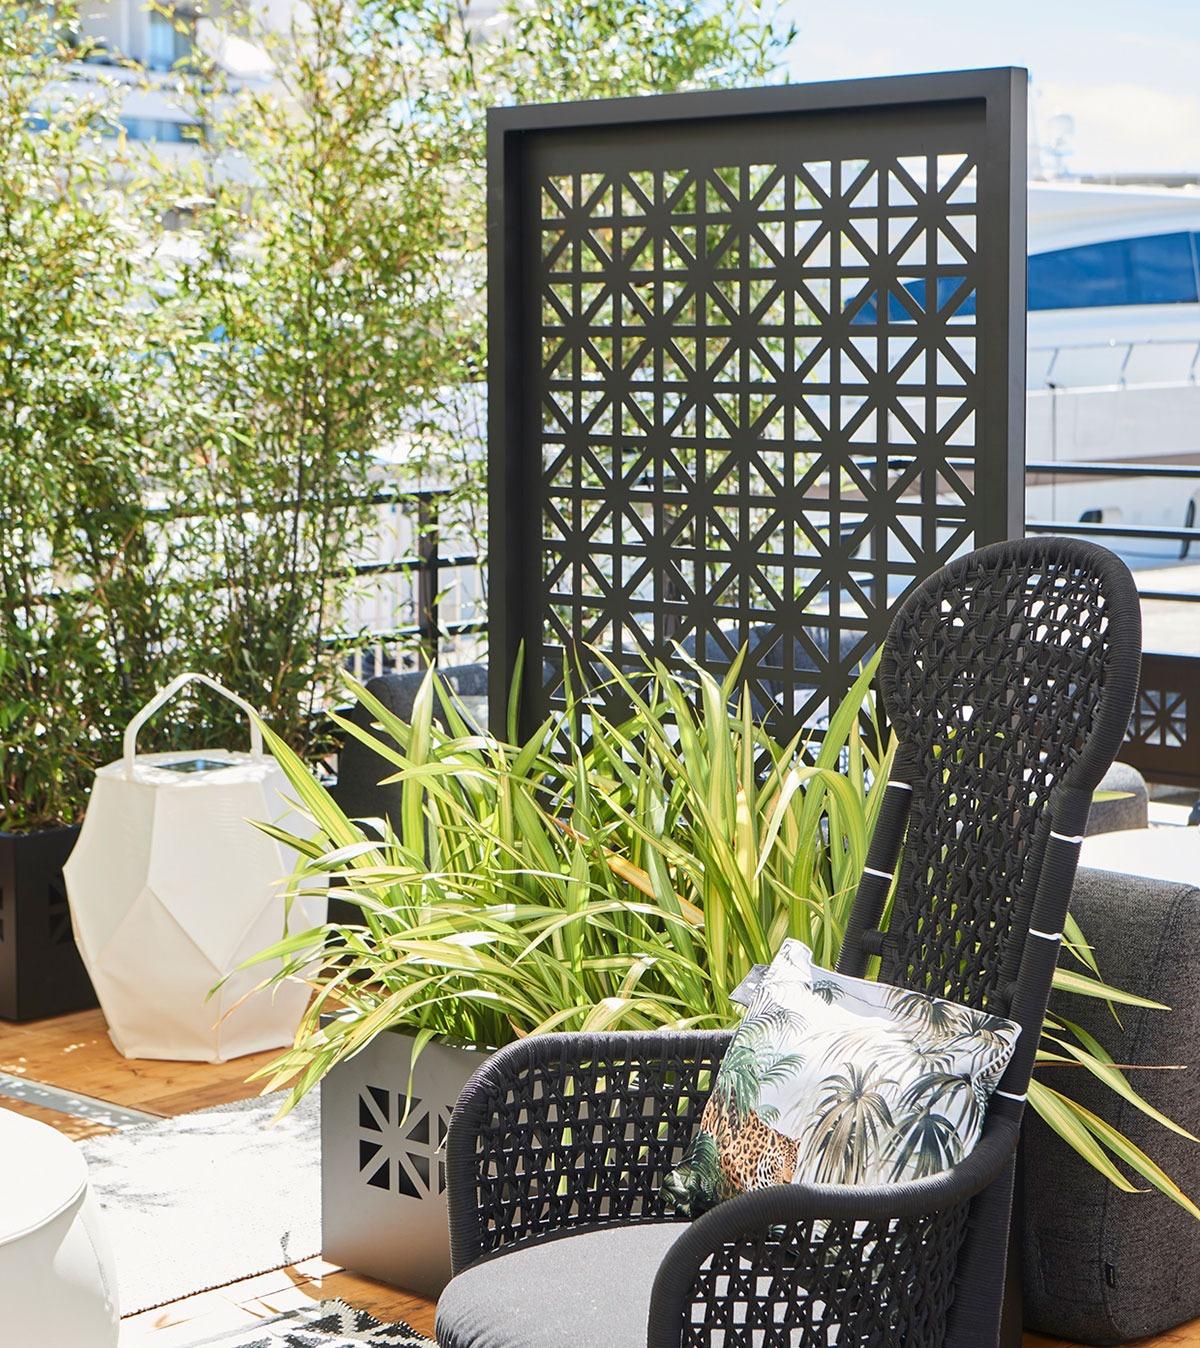 Habillage de jardinières en aluminium décor Sinema